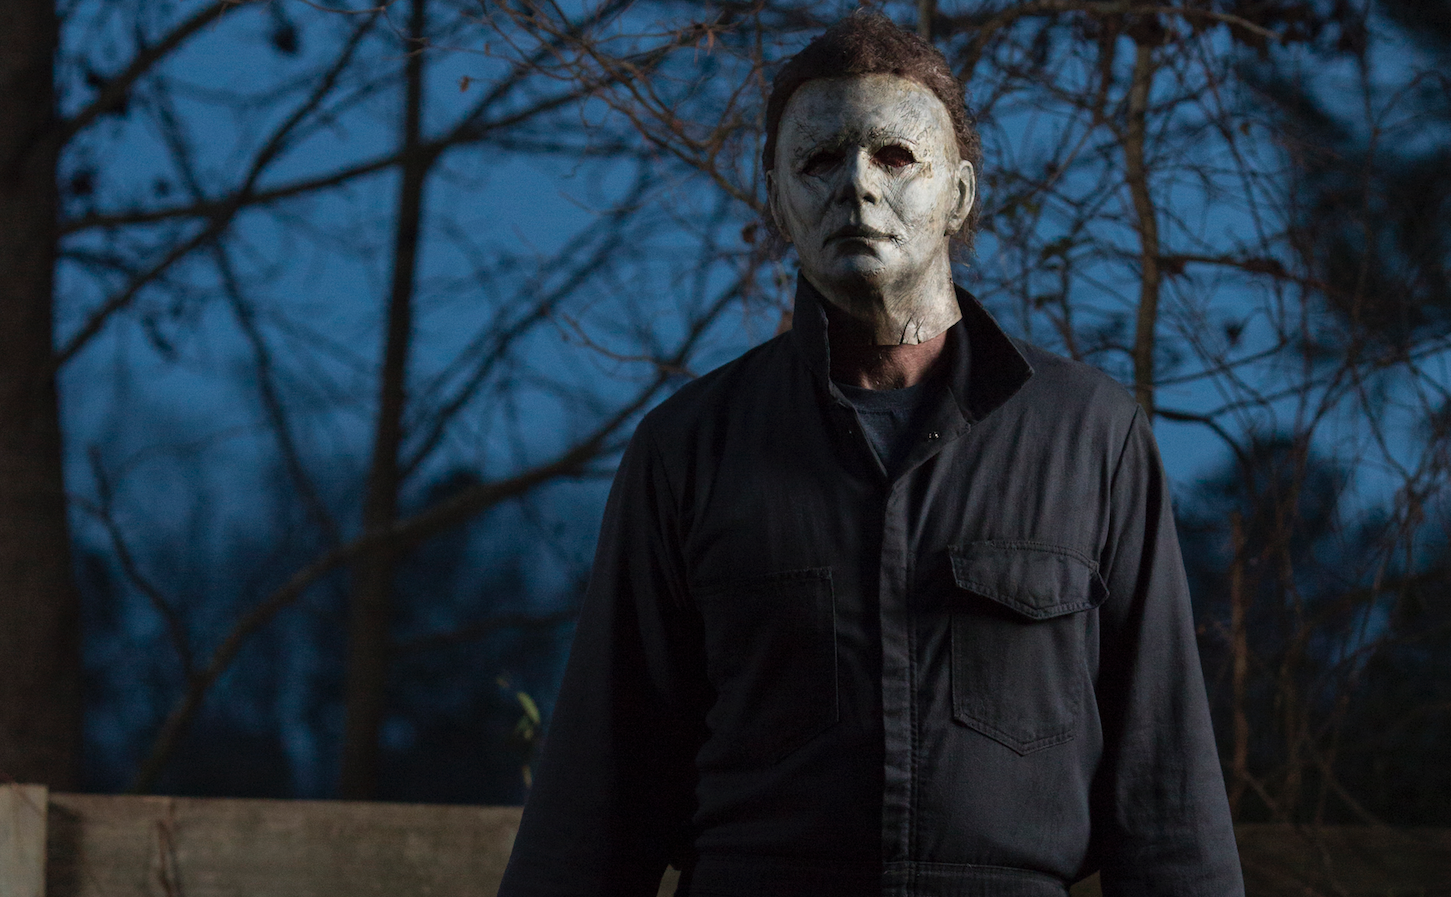 Work Has Already Begun On Next Halloween Film Exclusive